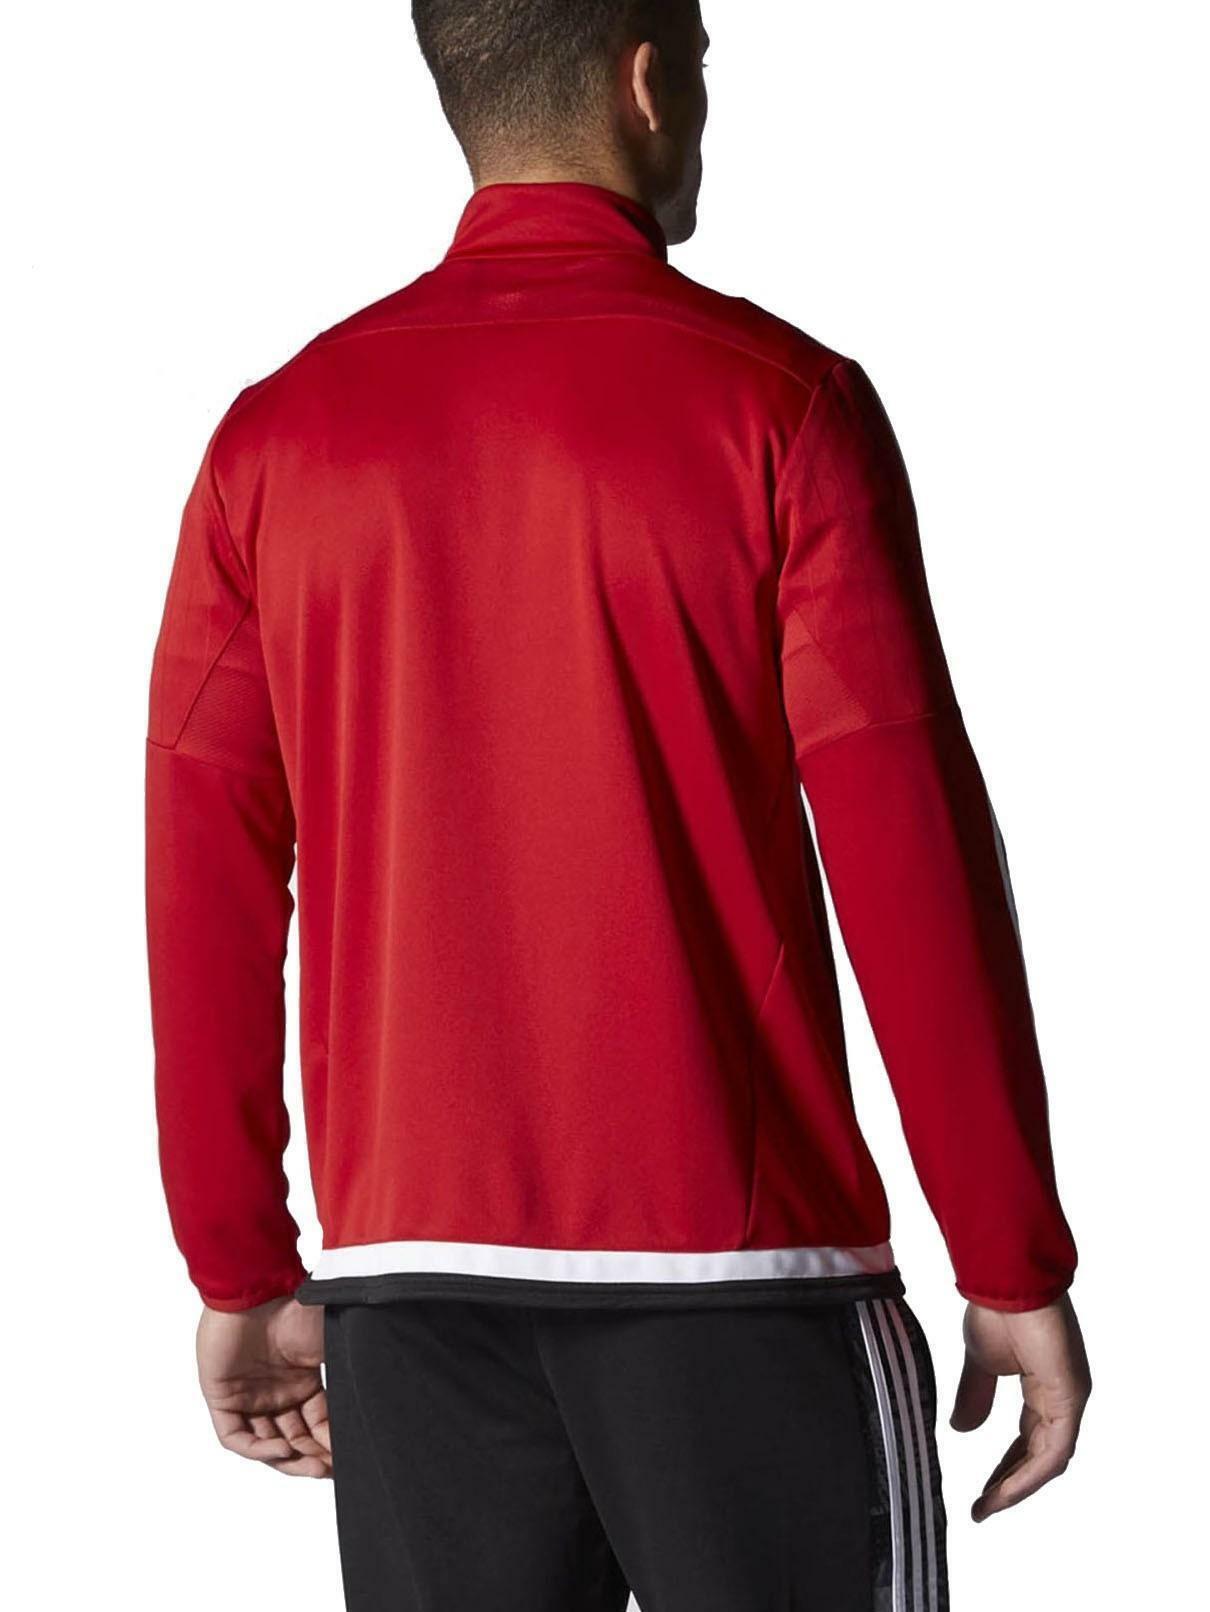 adidas adidas tiro15 trg giacchetto zip uomo rosso m64060